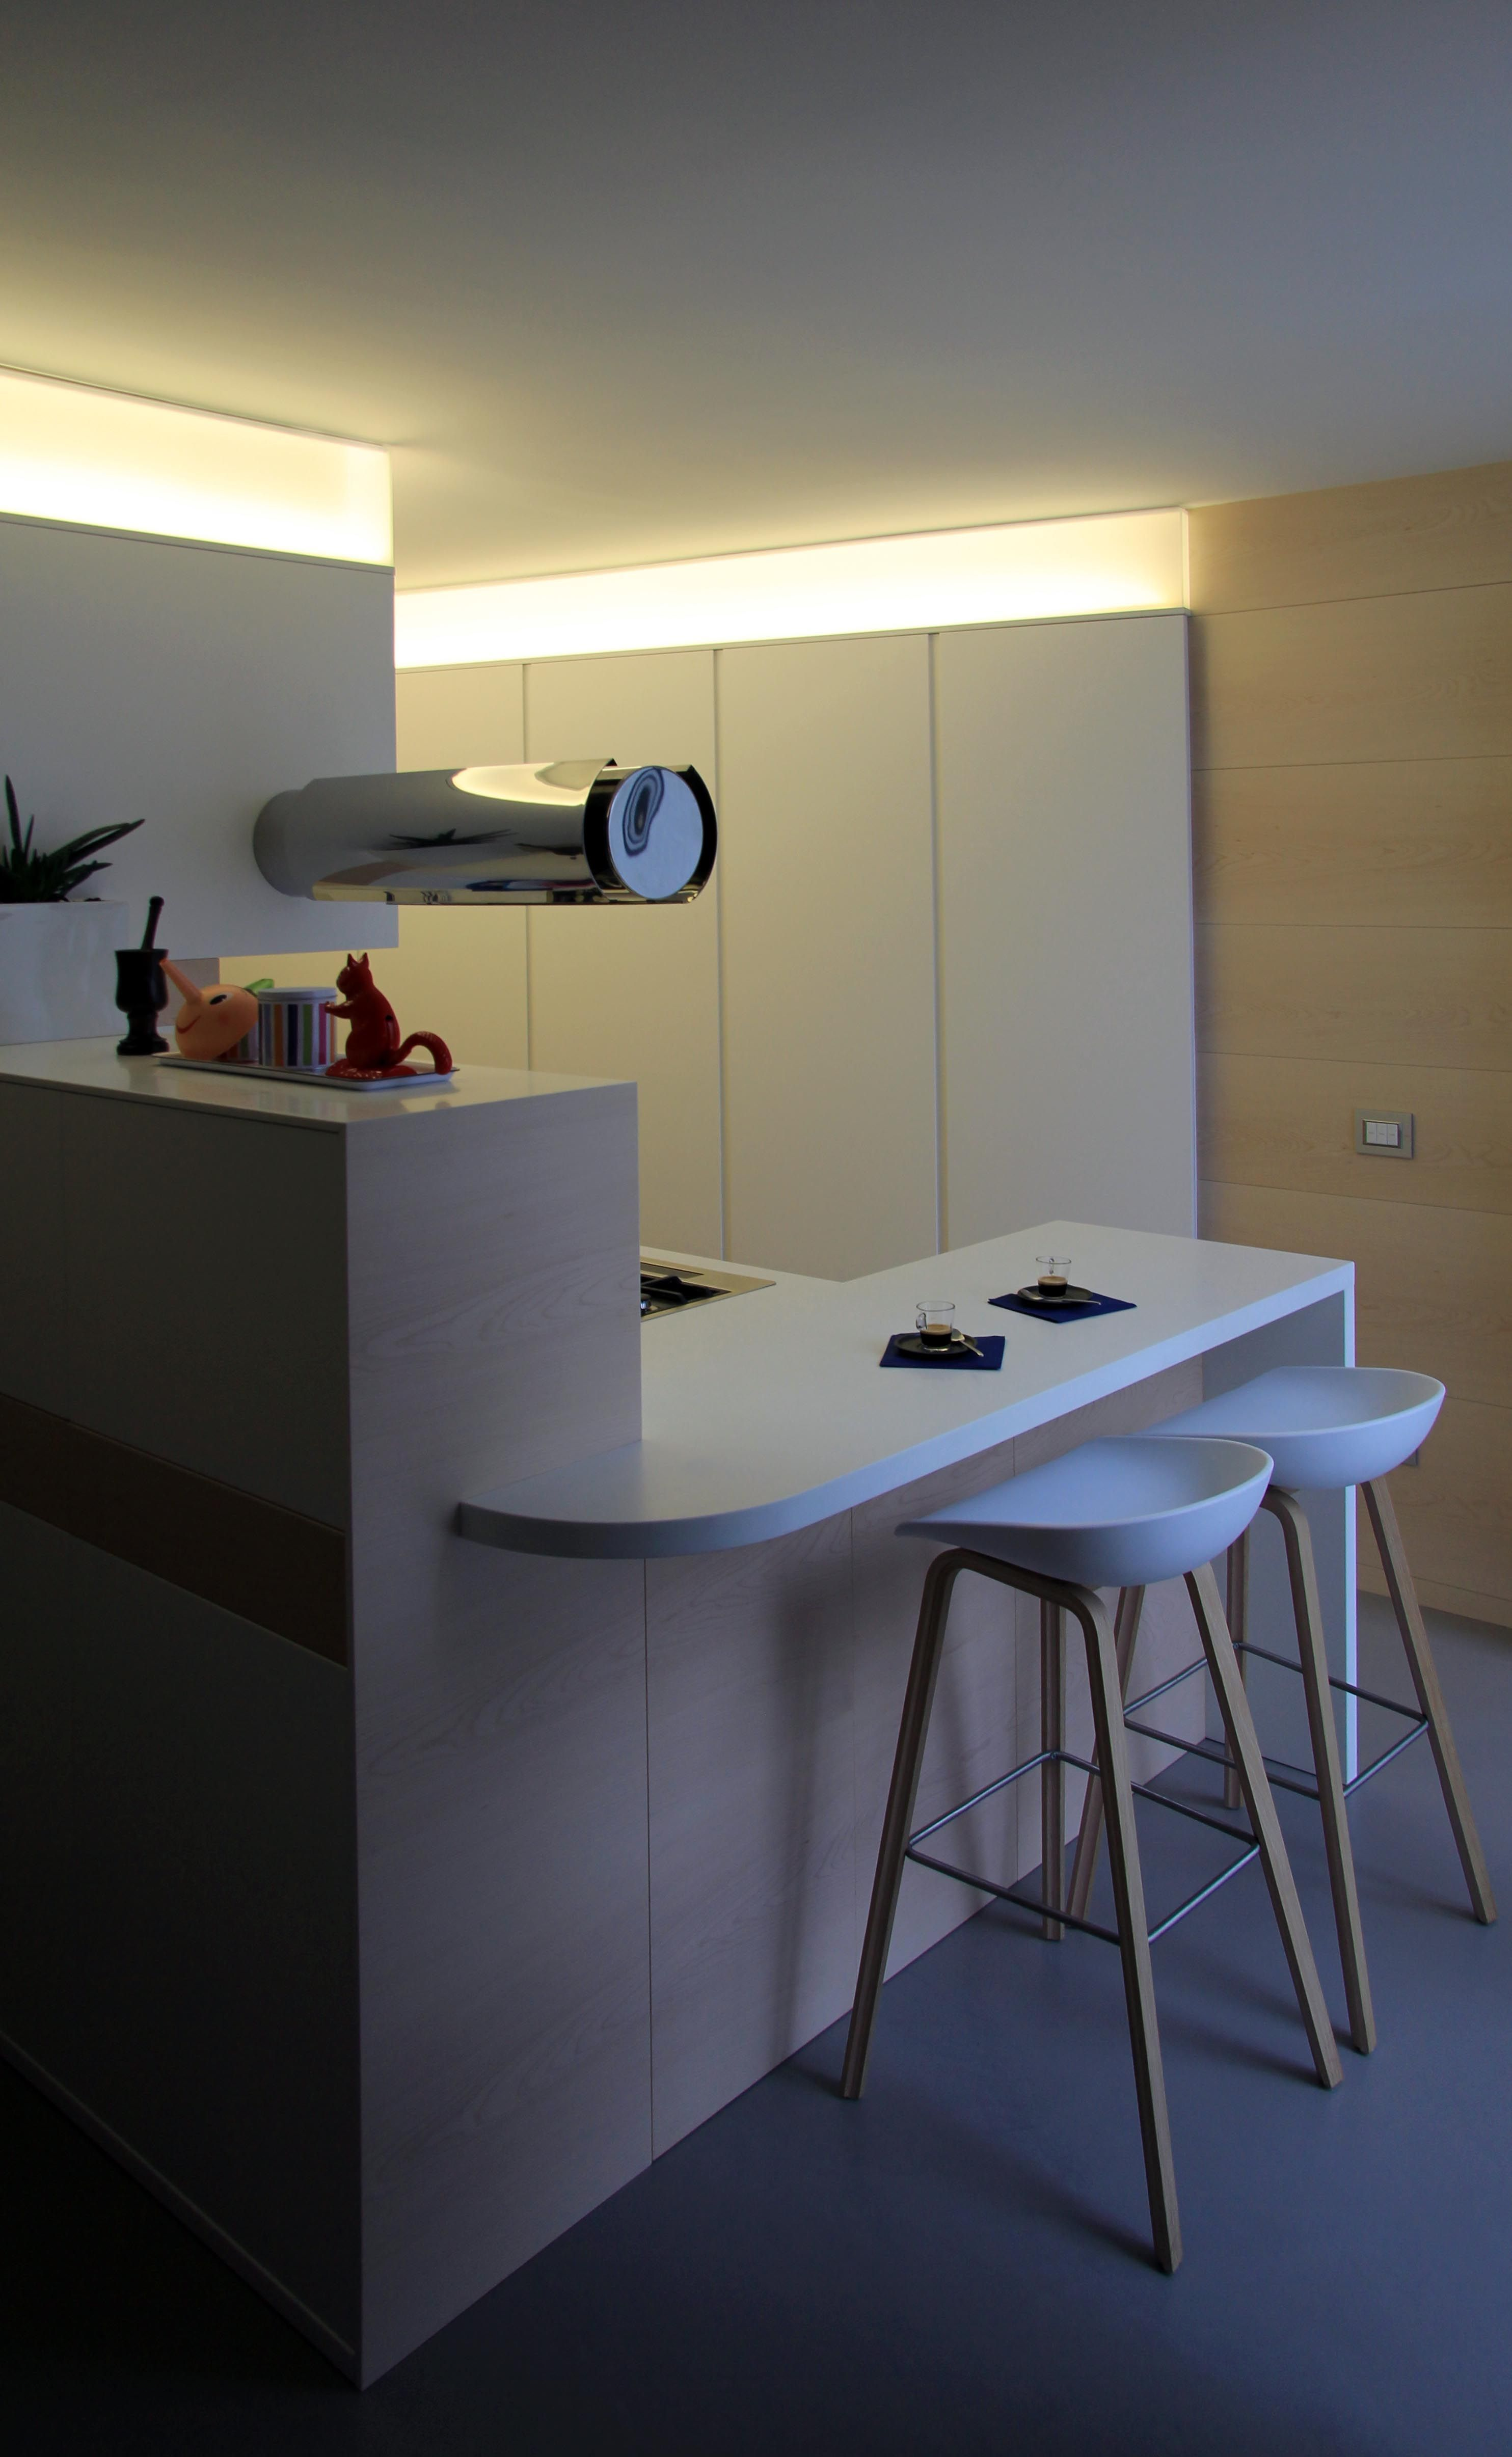 Cucina su misura, cappa sospesa piano in corian. illuminazione a Led ...